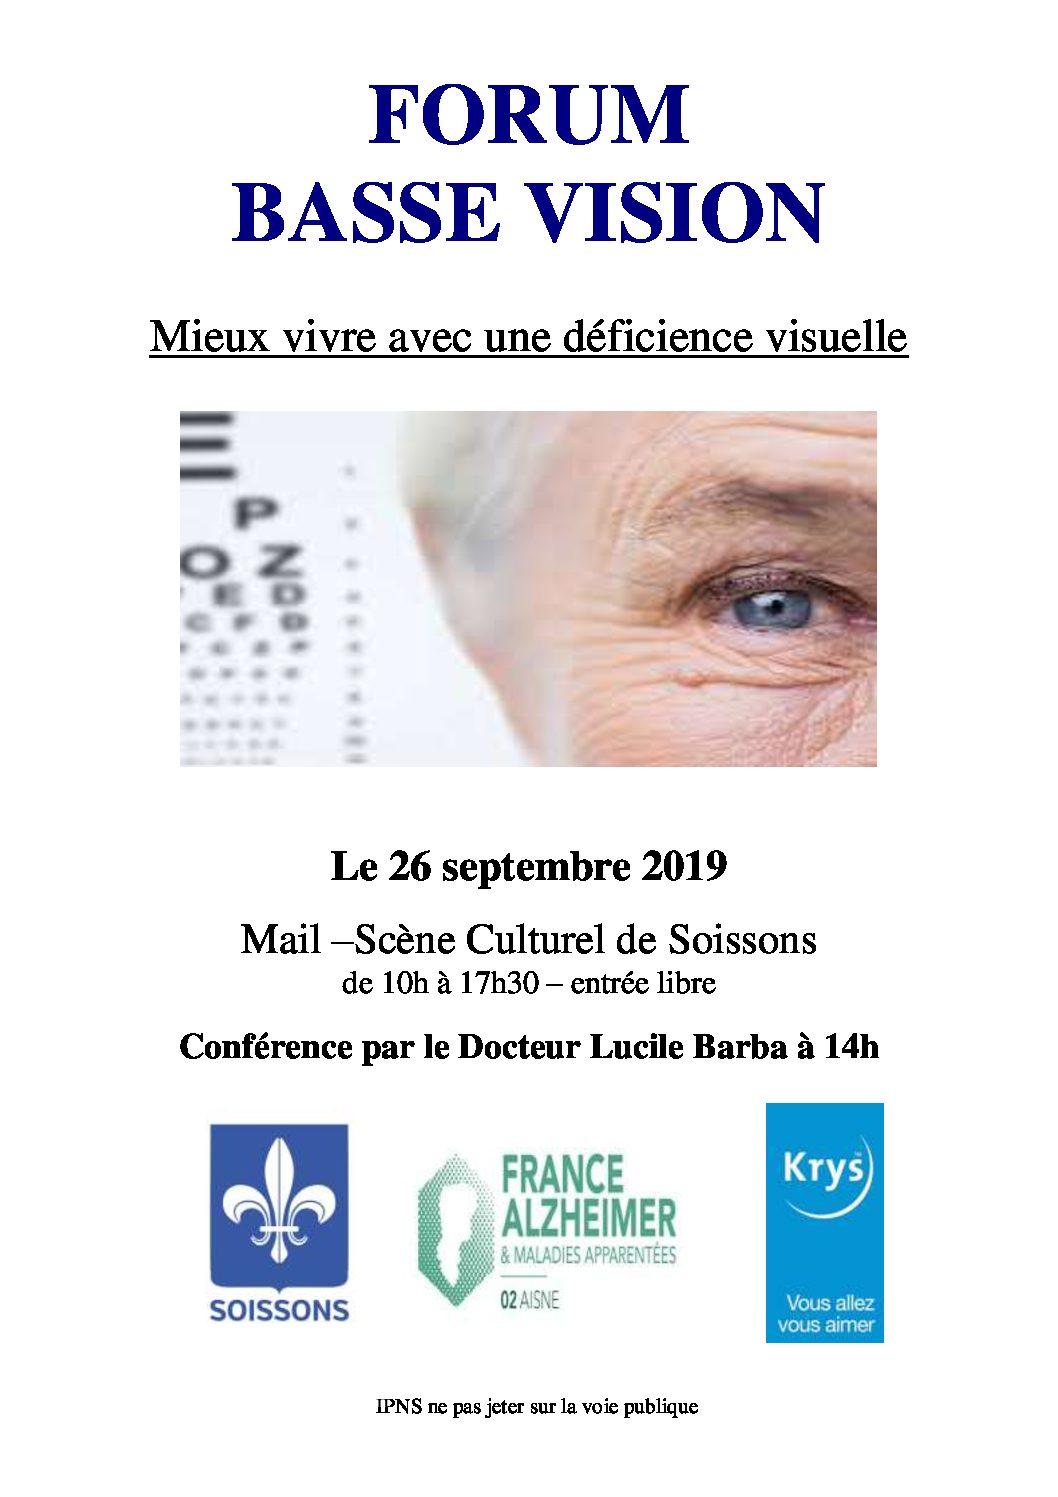 Forum basse vision